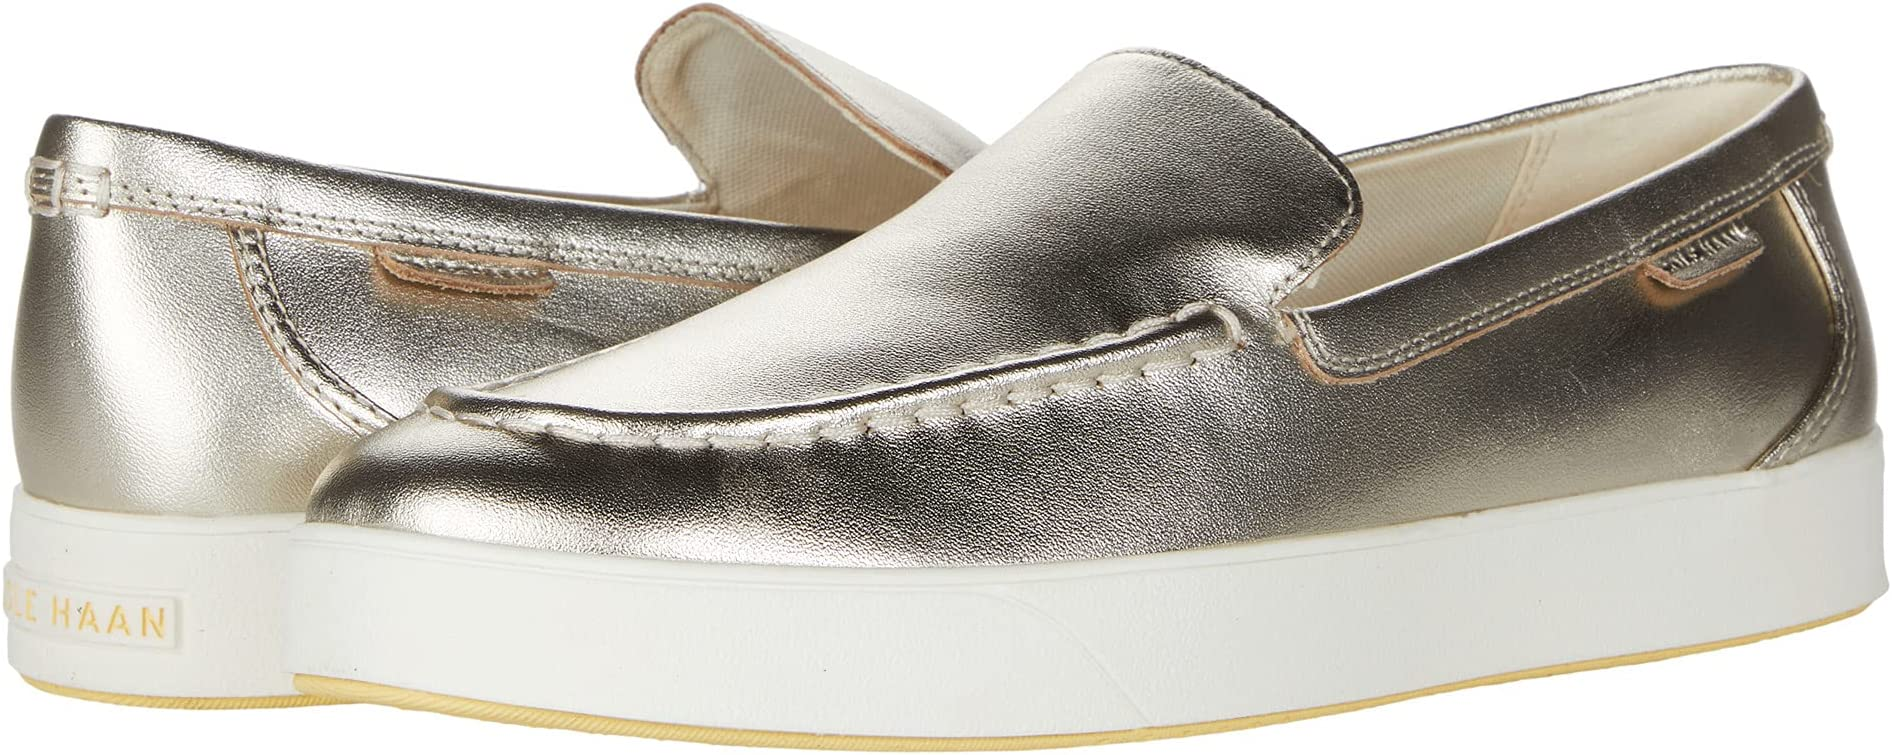 TC-2-Womens-Shoes-2021-05-07